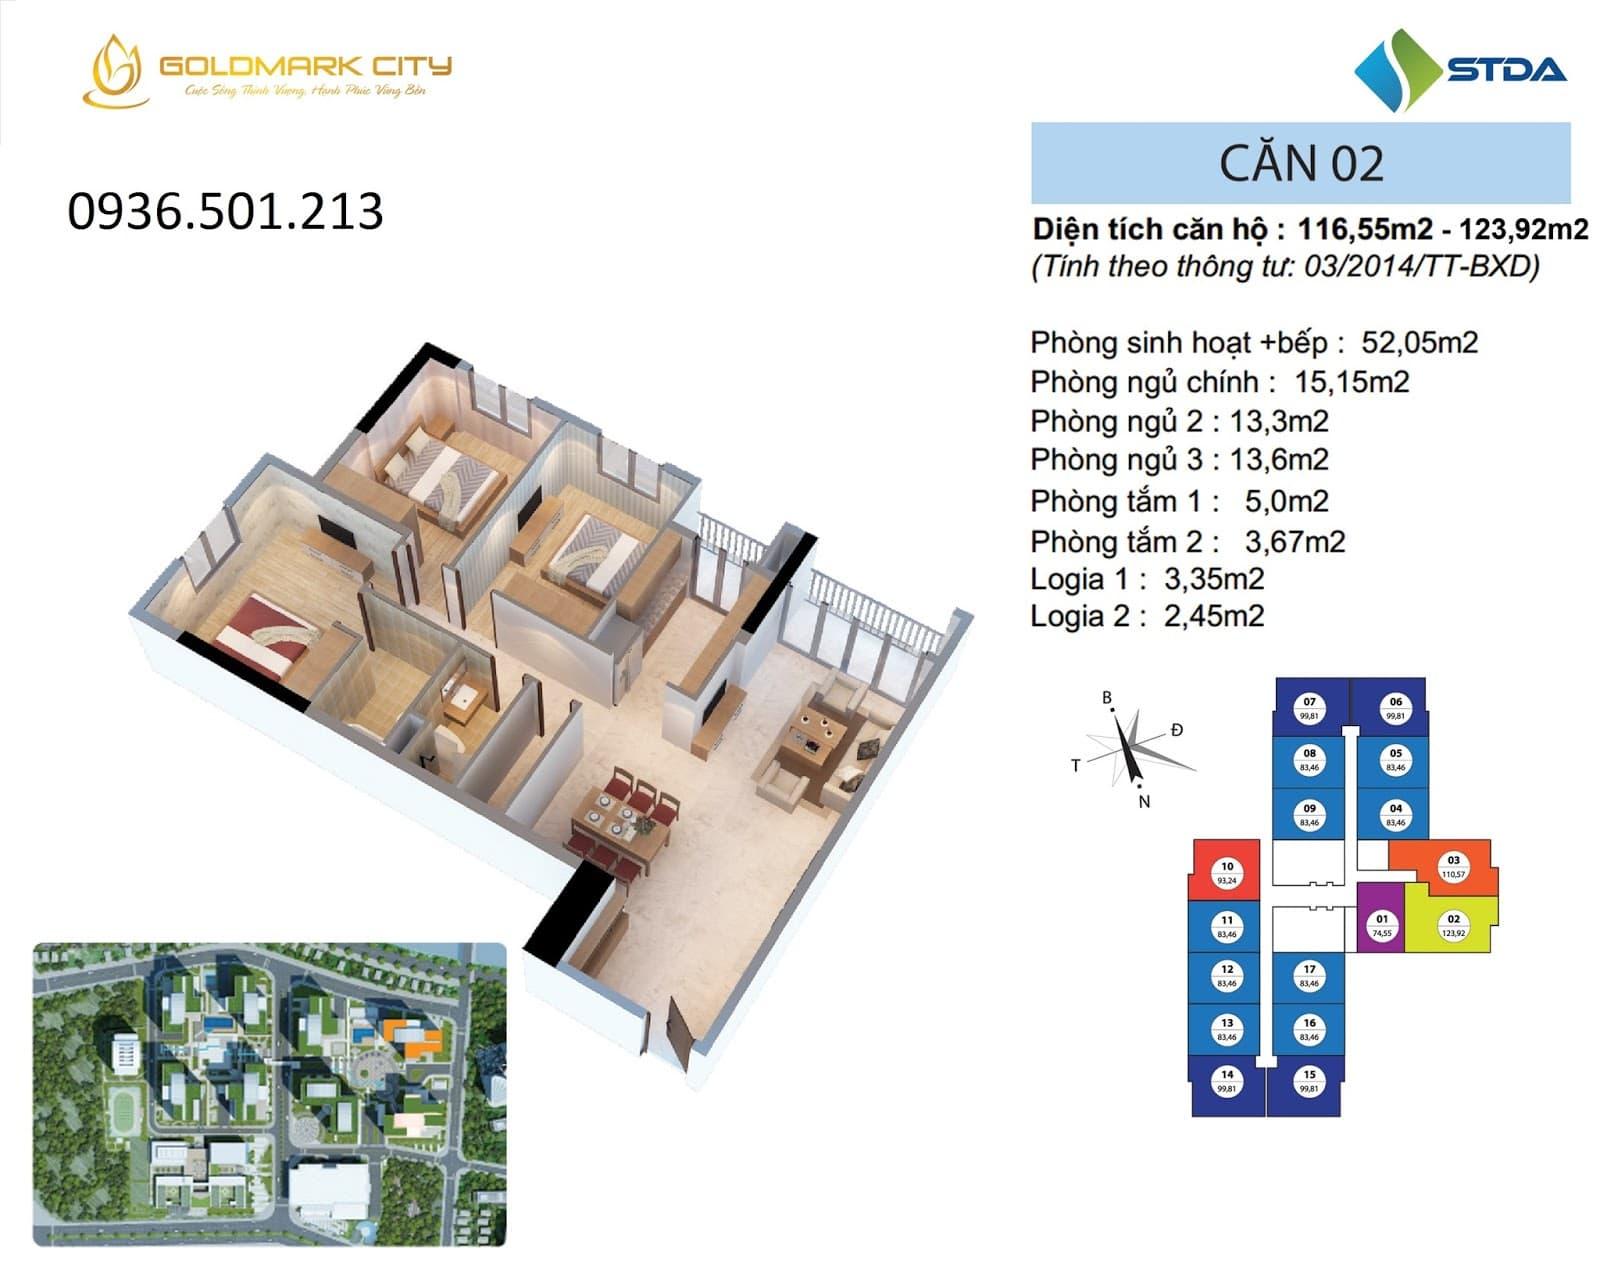 Mặt bằng căn hộ số 02 ruby 2- Goldmark City 136 Hồ Tùng Mậu